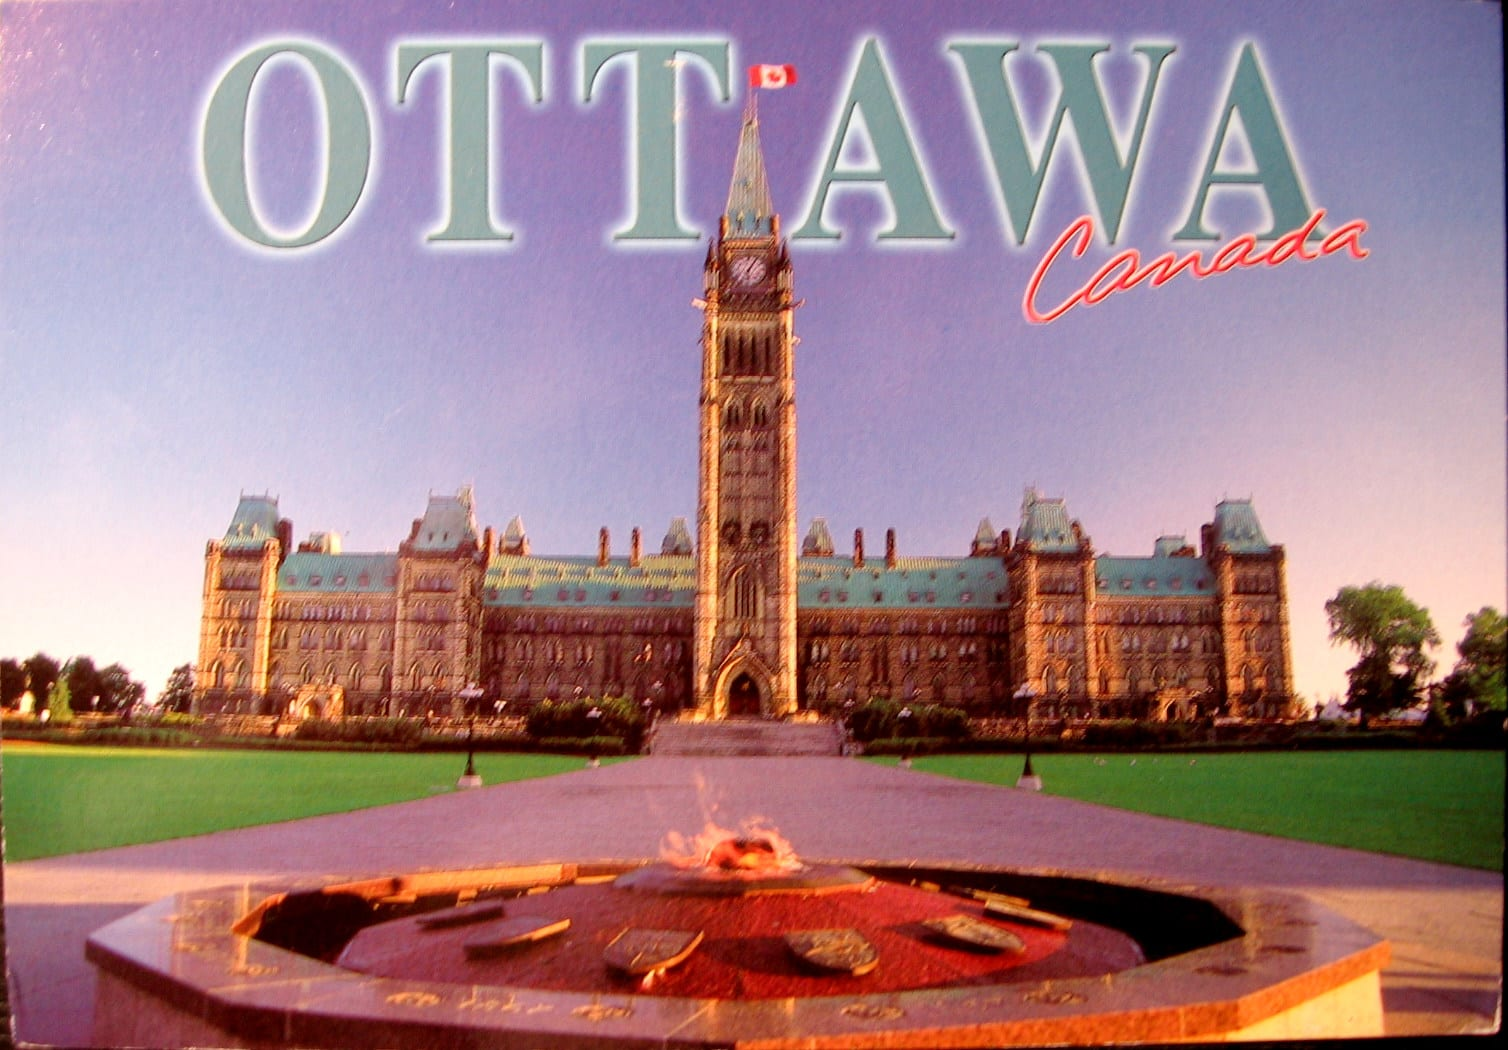 Pošalji mi razglednicu, neću SMS, po azbuci - Page 22 Send-you-a-postcard-from-ottawa-canada